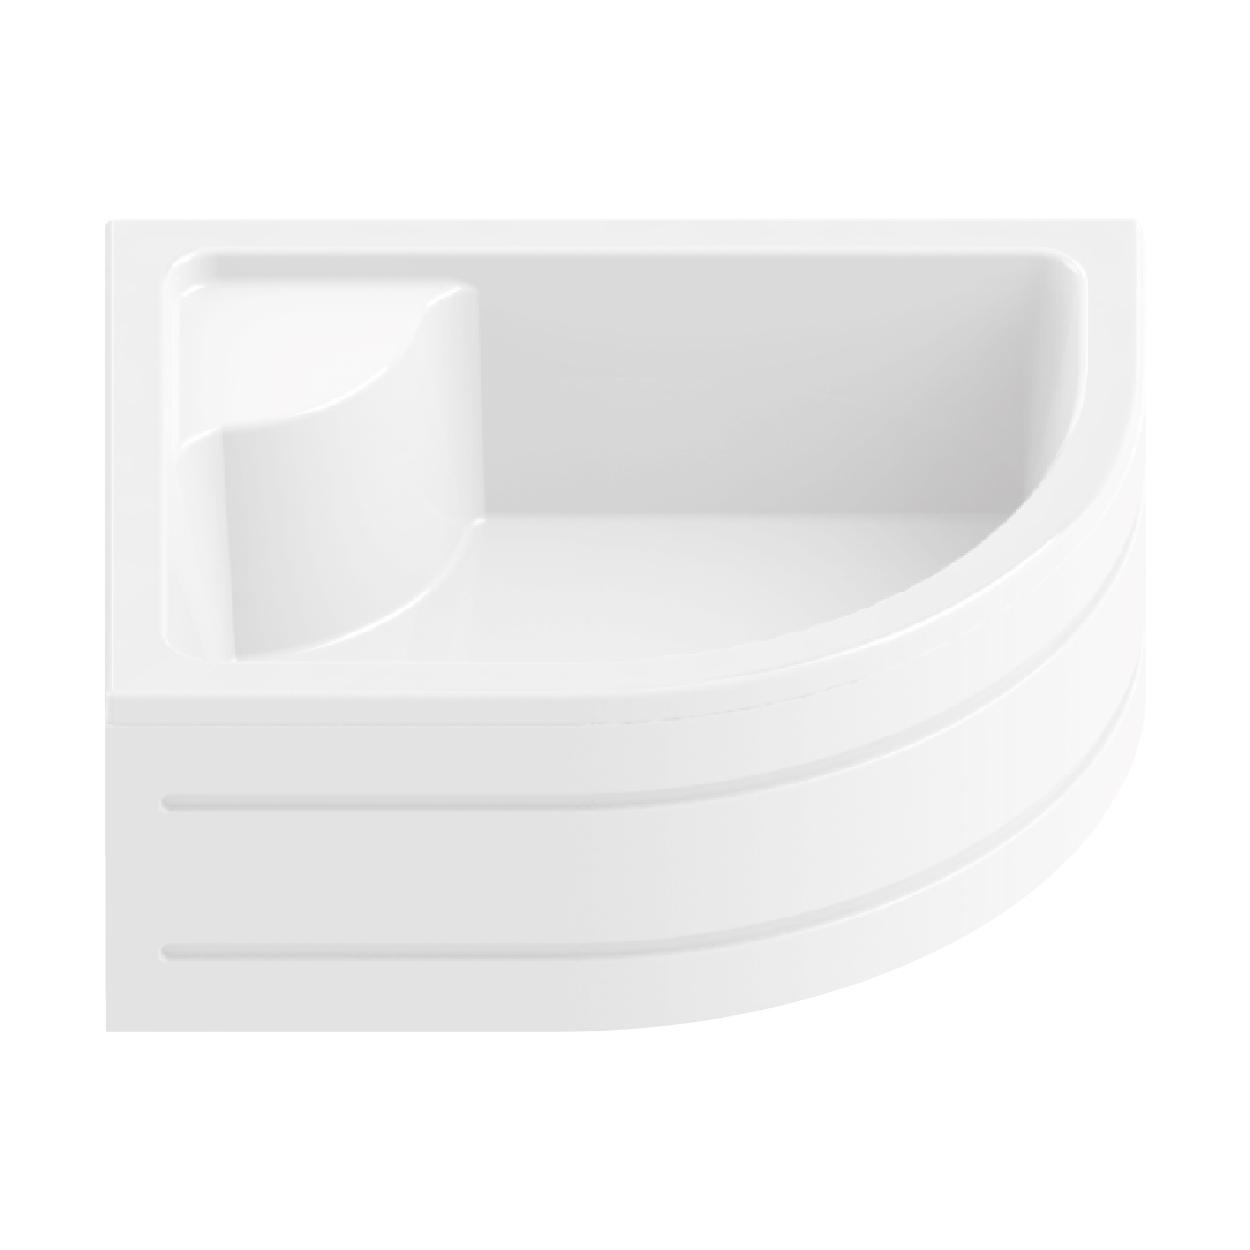 Панель для душевого поддона New Trendy Maxima 100х80×37 0-0091